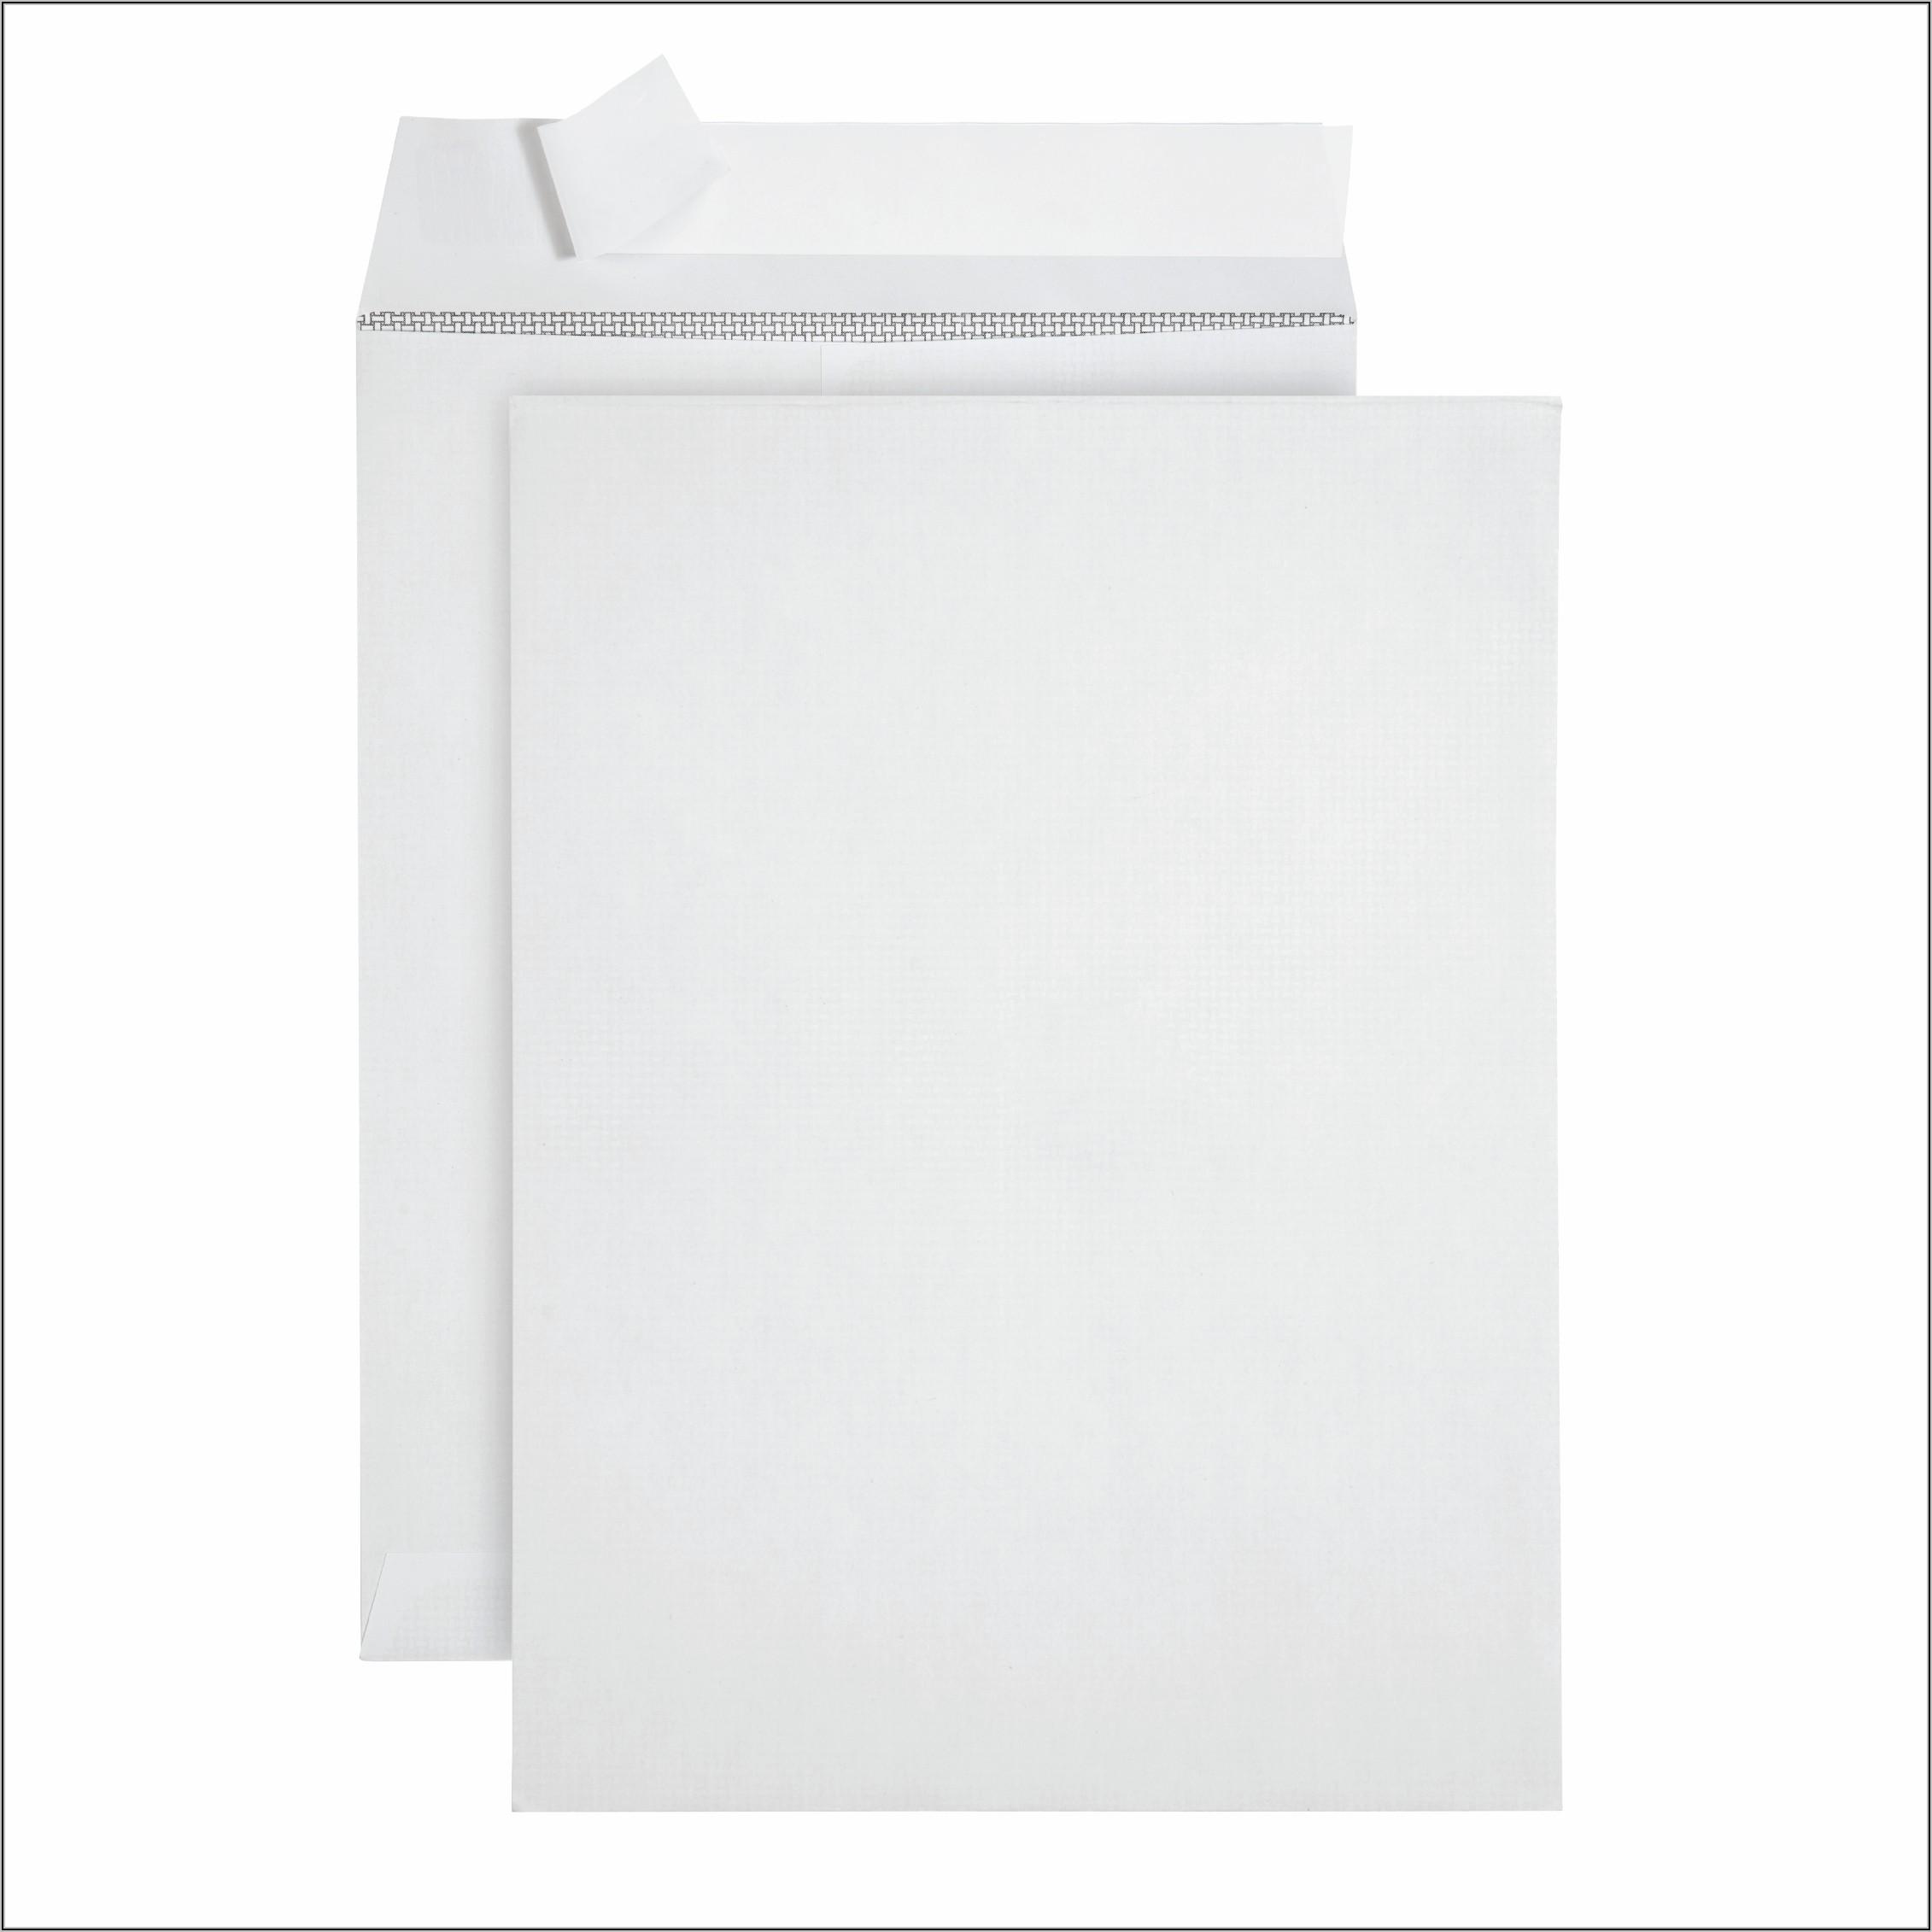 9 X 12 White Catalog Envelopes